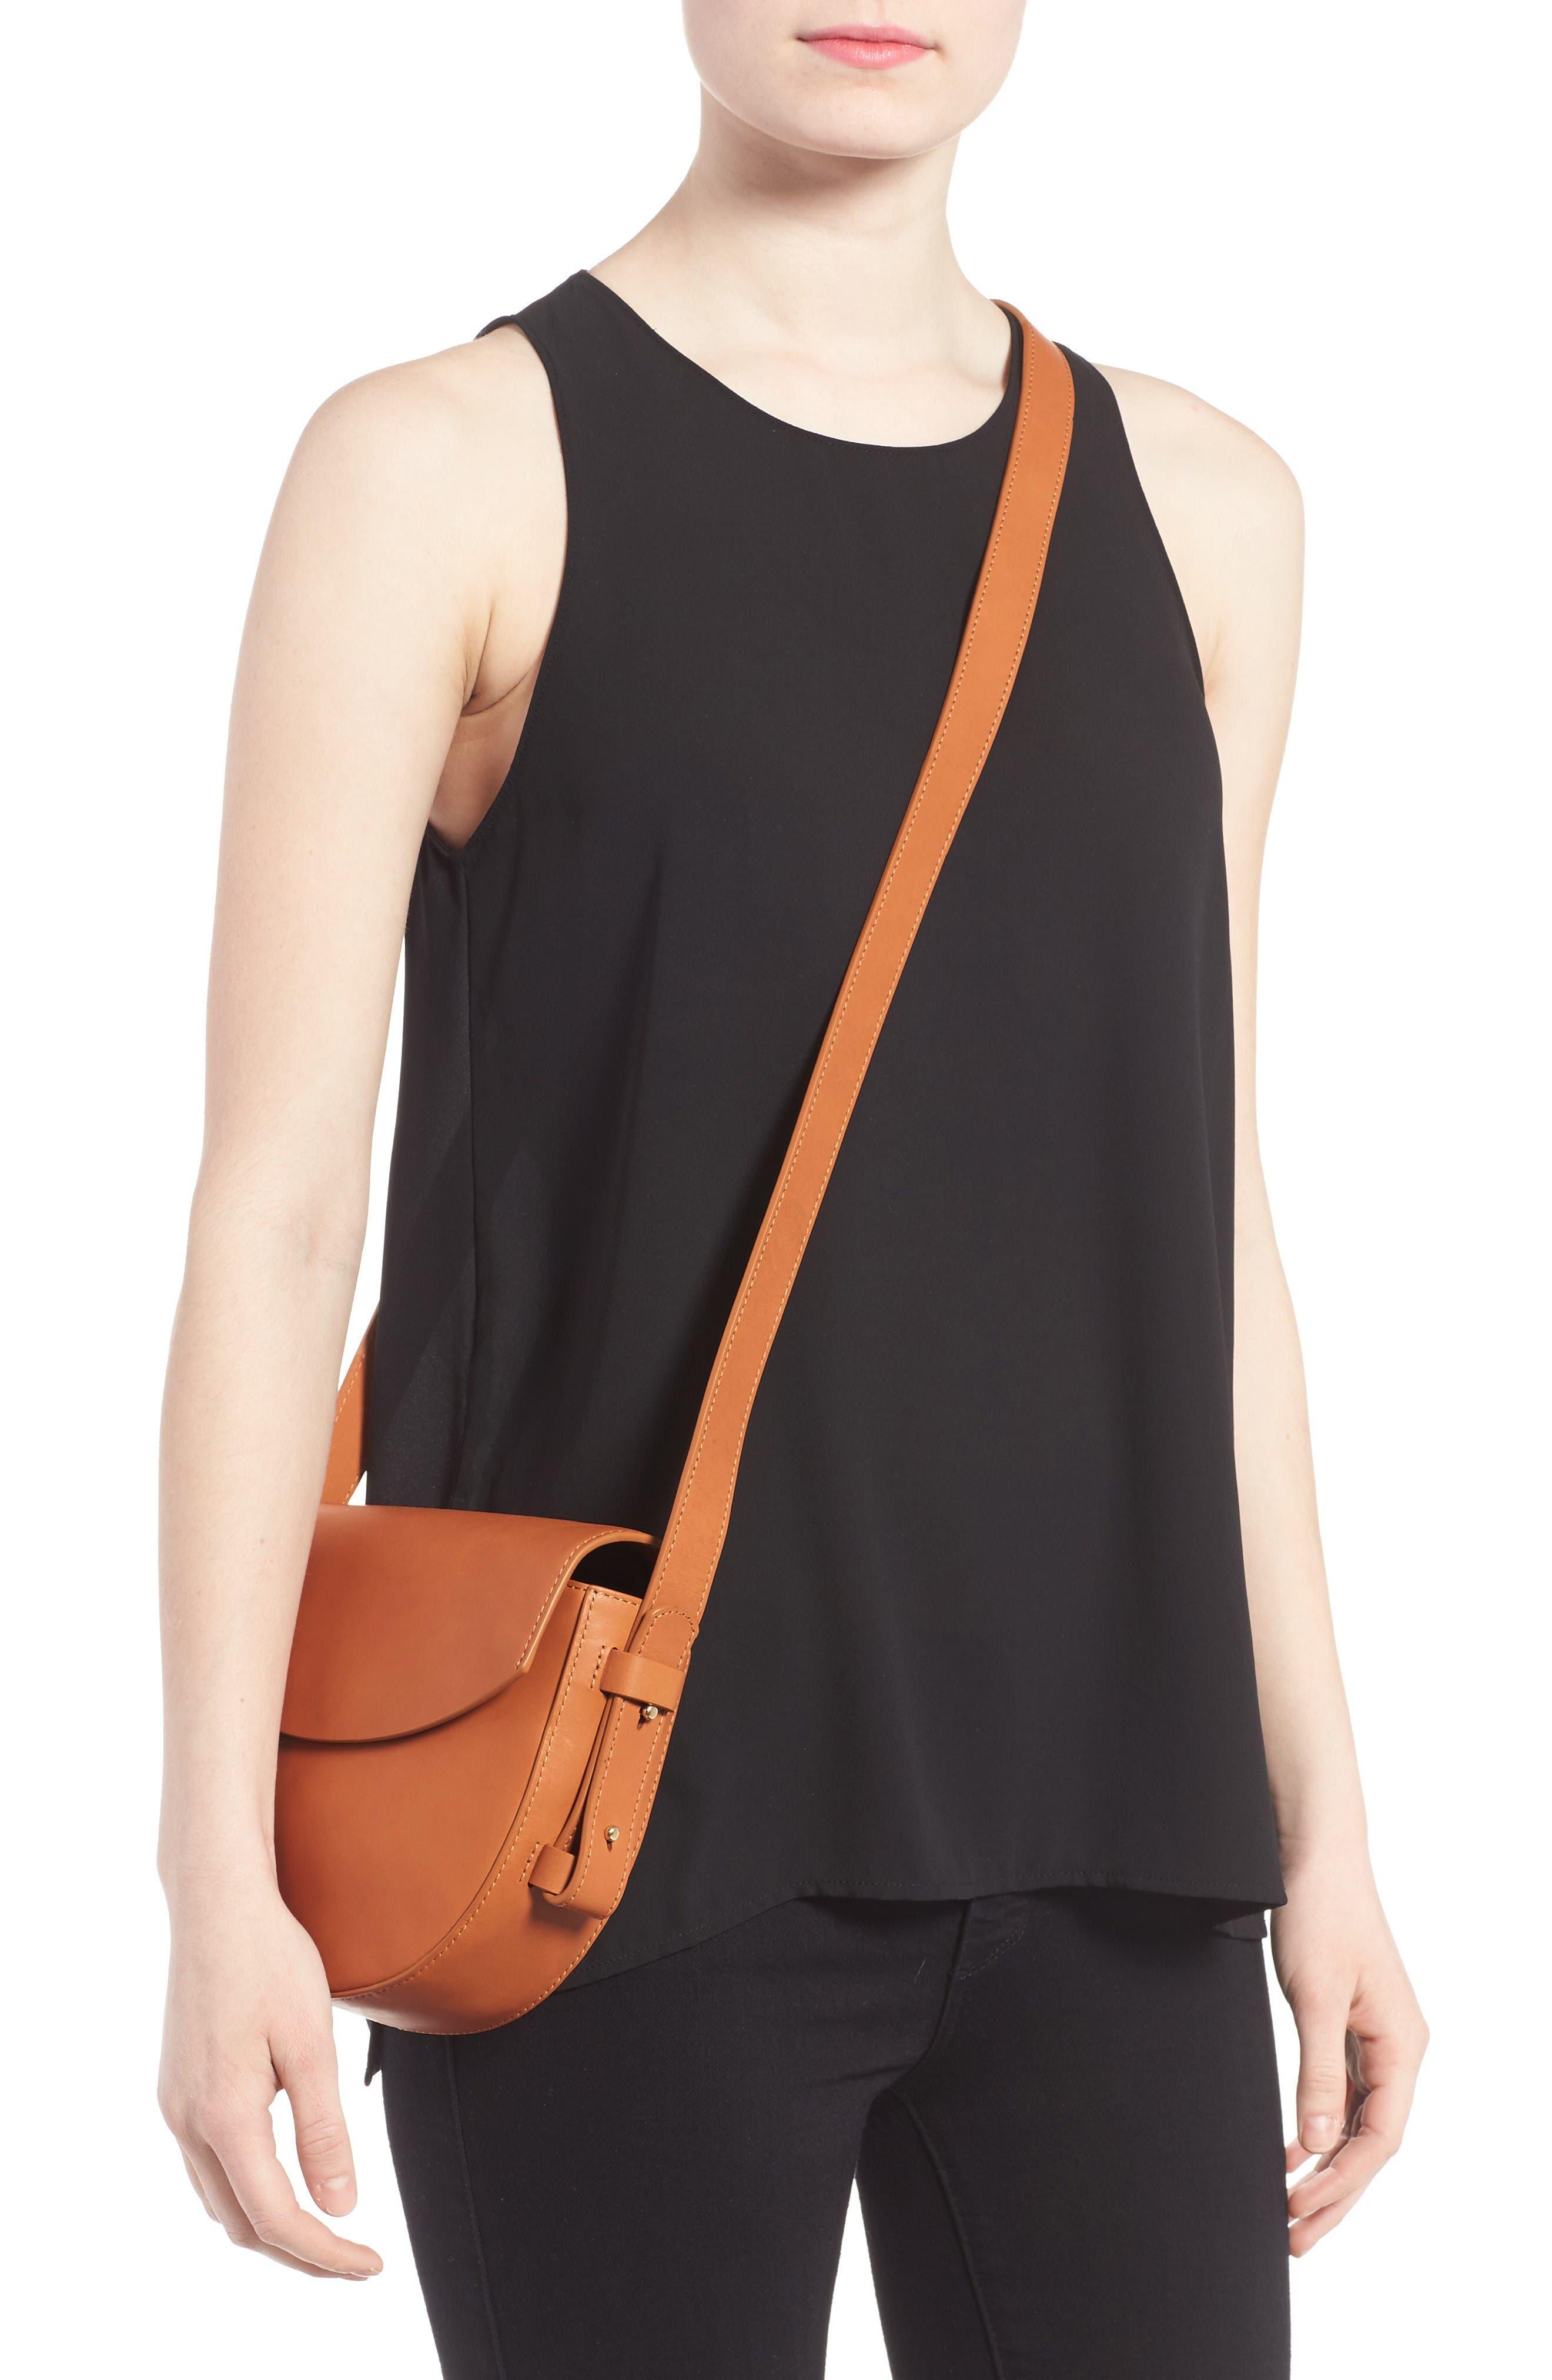 Lobelle Leather Saddle Bag,                             Alternate thumbnail 2, color,                             Tan